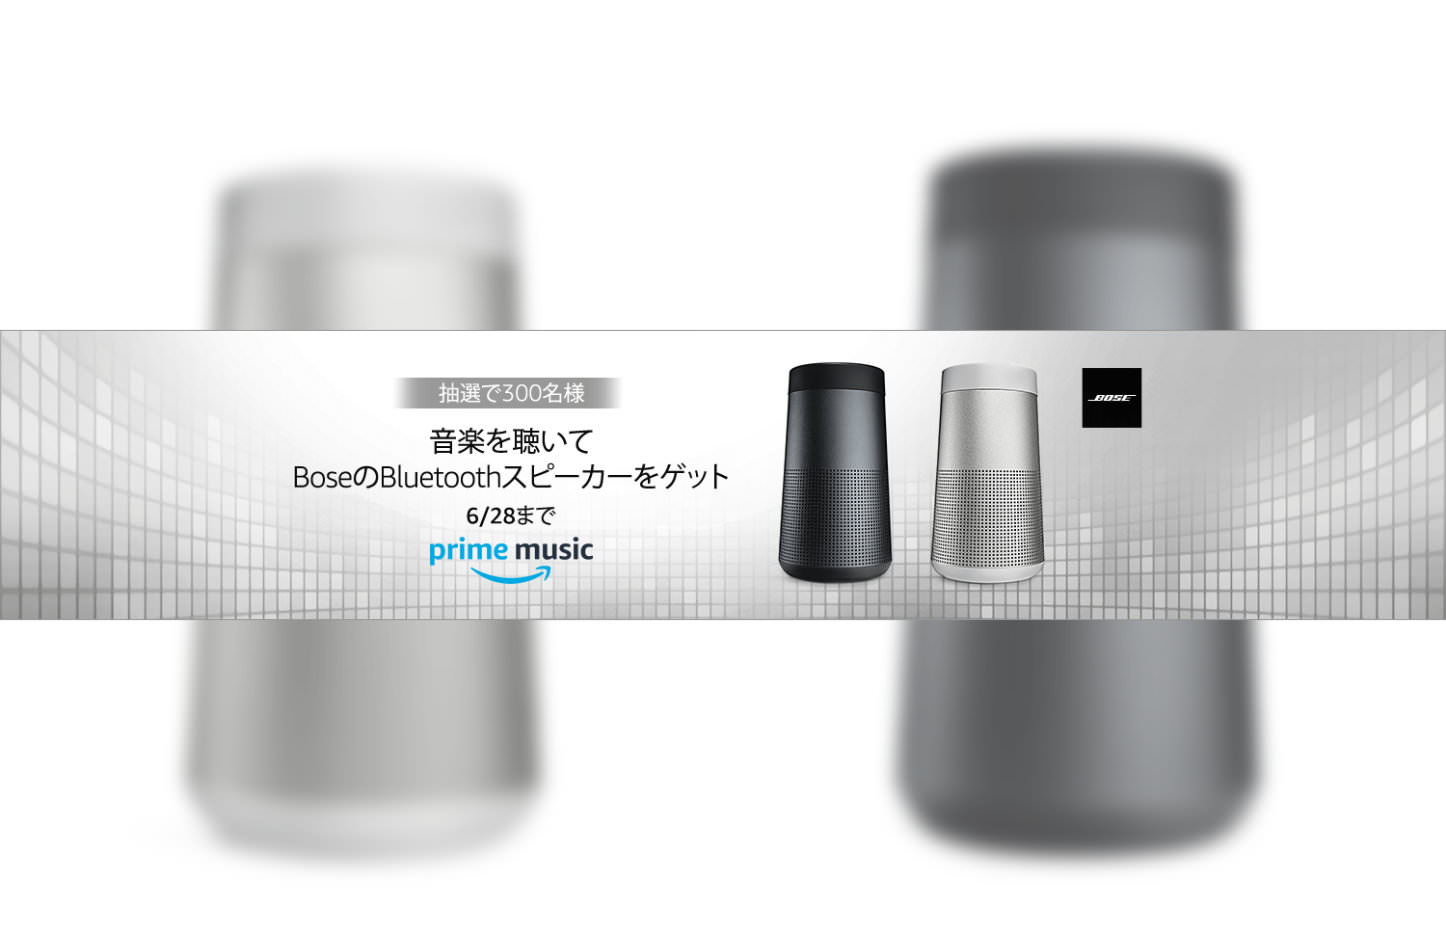 Bose Bluetooth Speaker Present